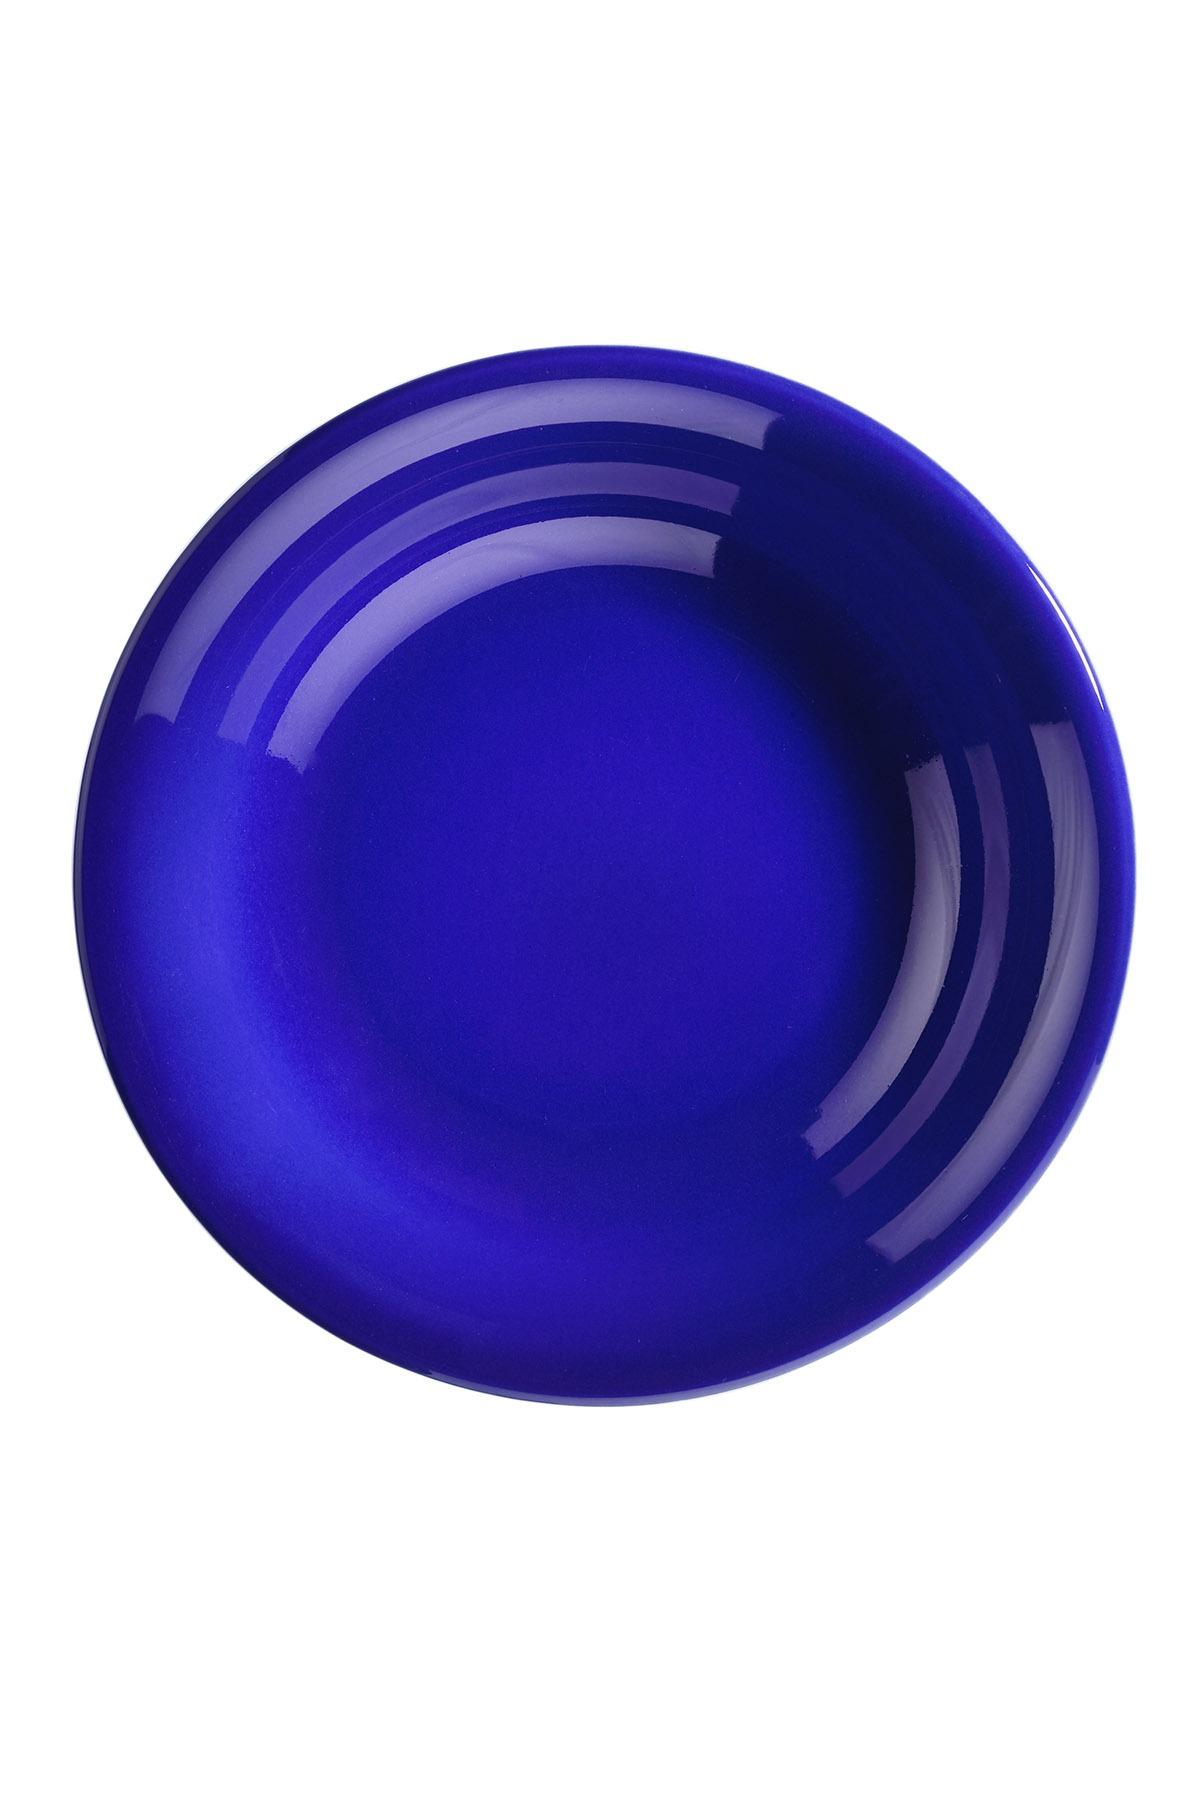 Kütahya Porselen Nanoceram 24 Parça Yemek Seti 880154